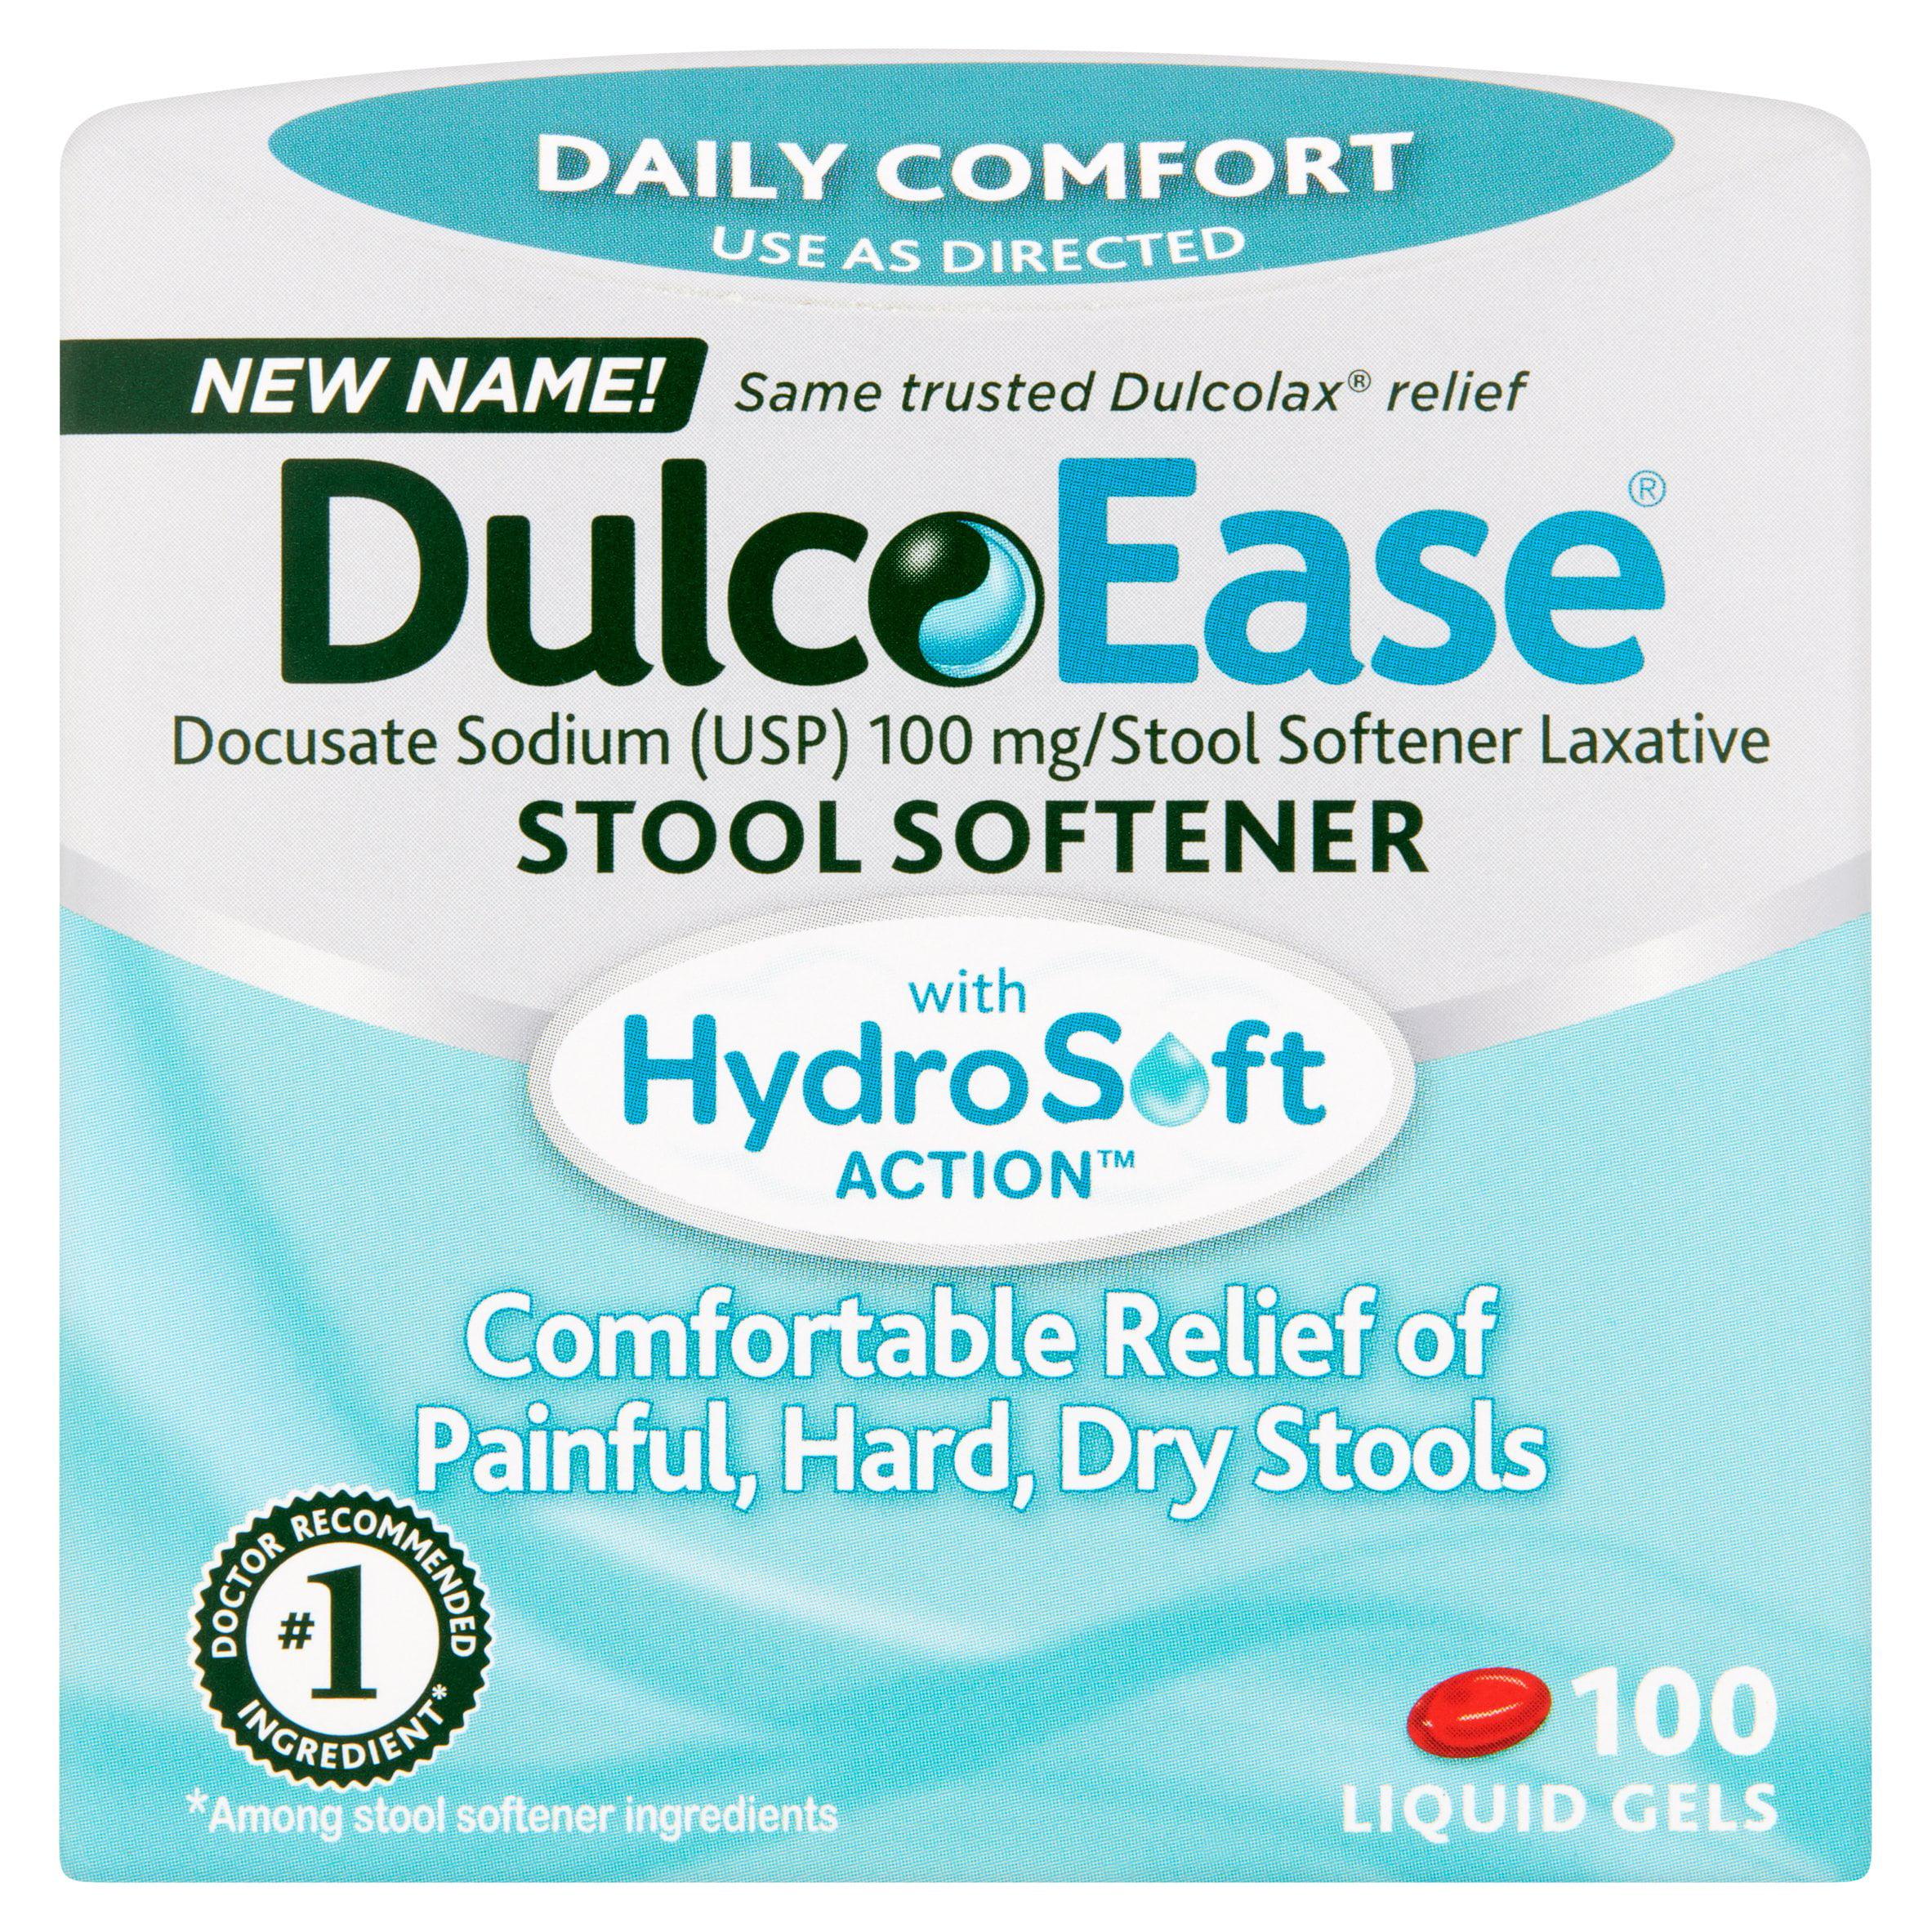 Dulcolax Stool Softener Warnings